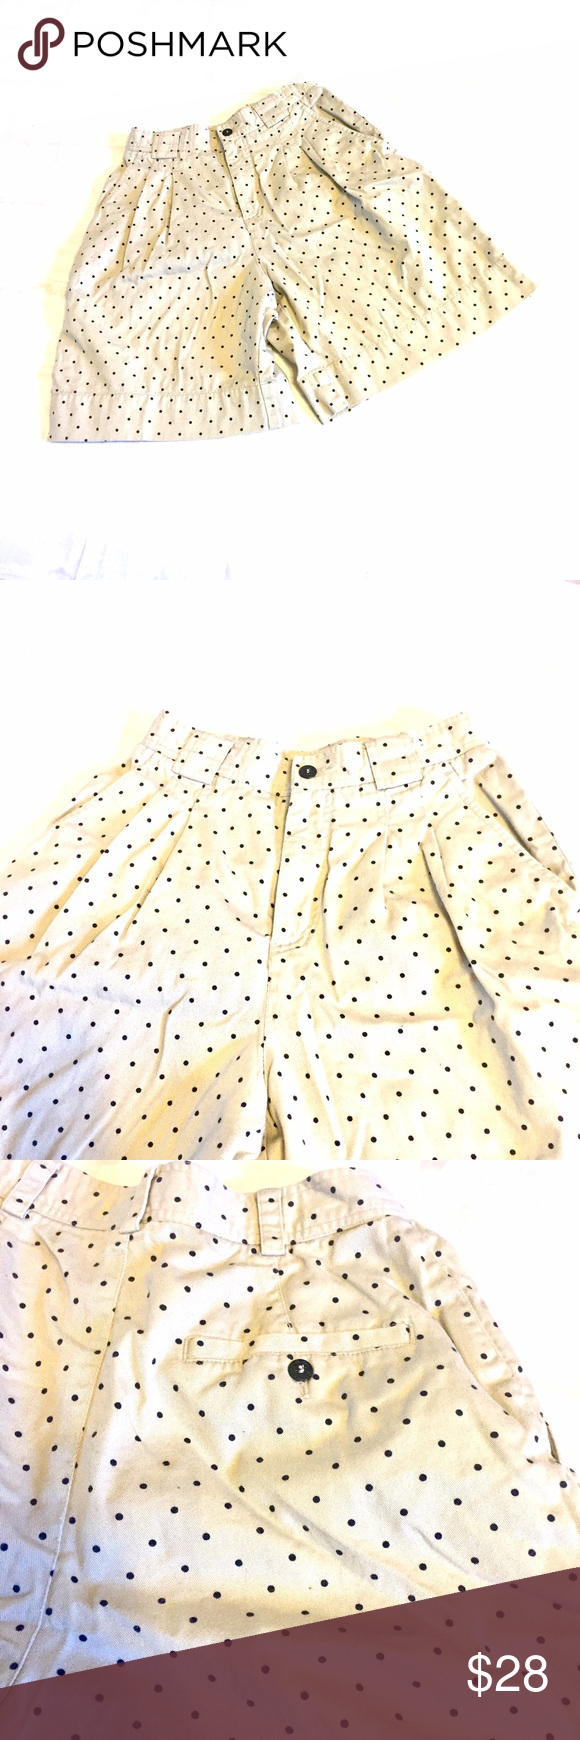 "Vintage LizSport Khaki Polka Dot Shorts Great condition! Fun vintage shorts.  Size 4. Inseam 7"" waist flat 12"" 100% cotton Shorts"